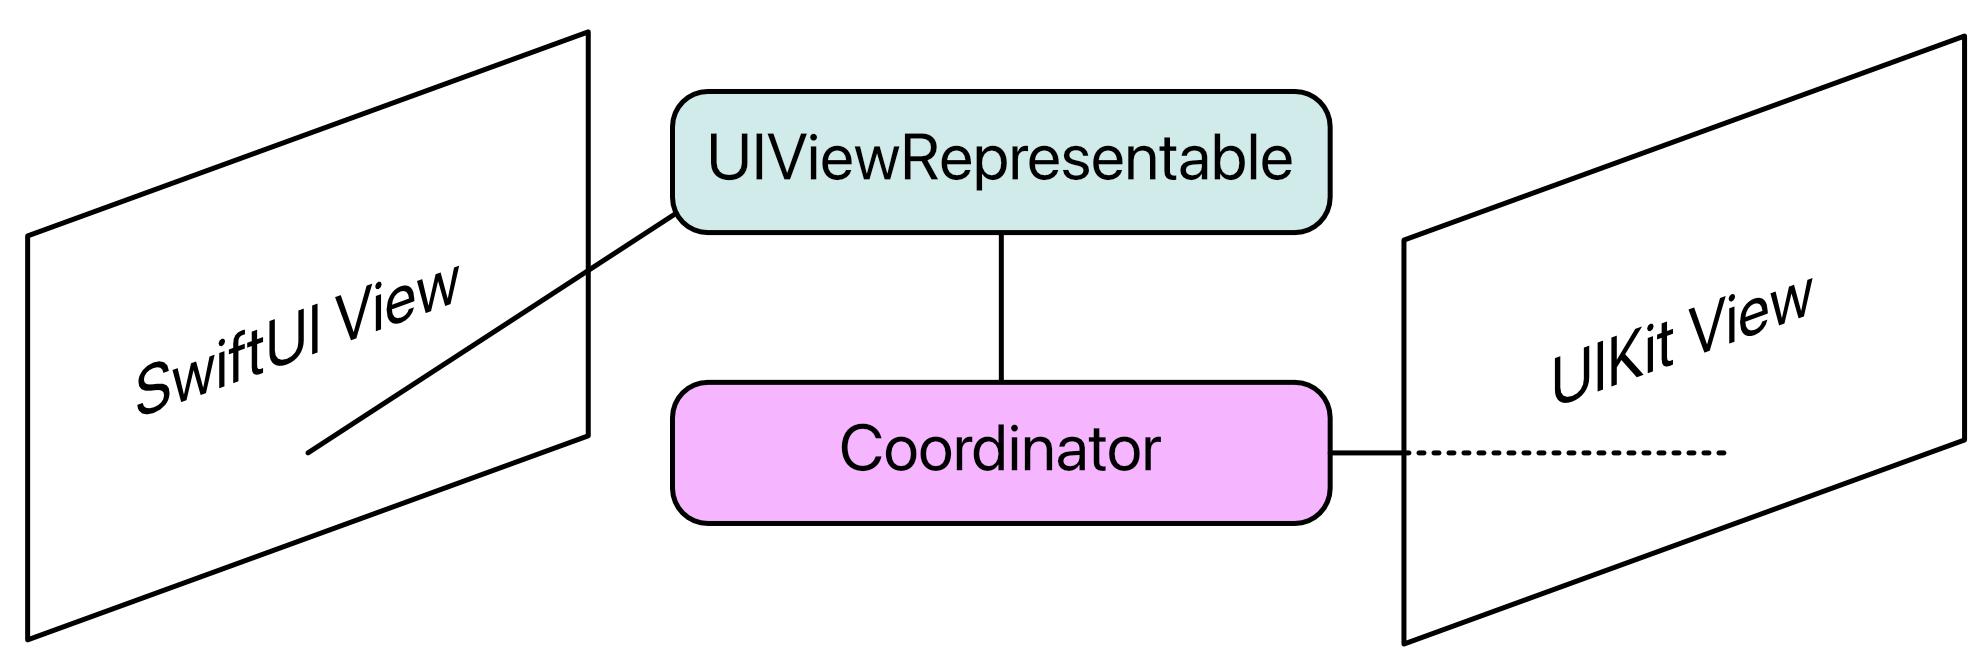 Integrating a UIKit view